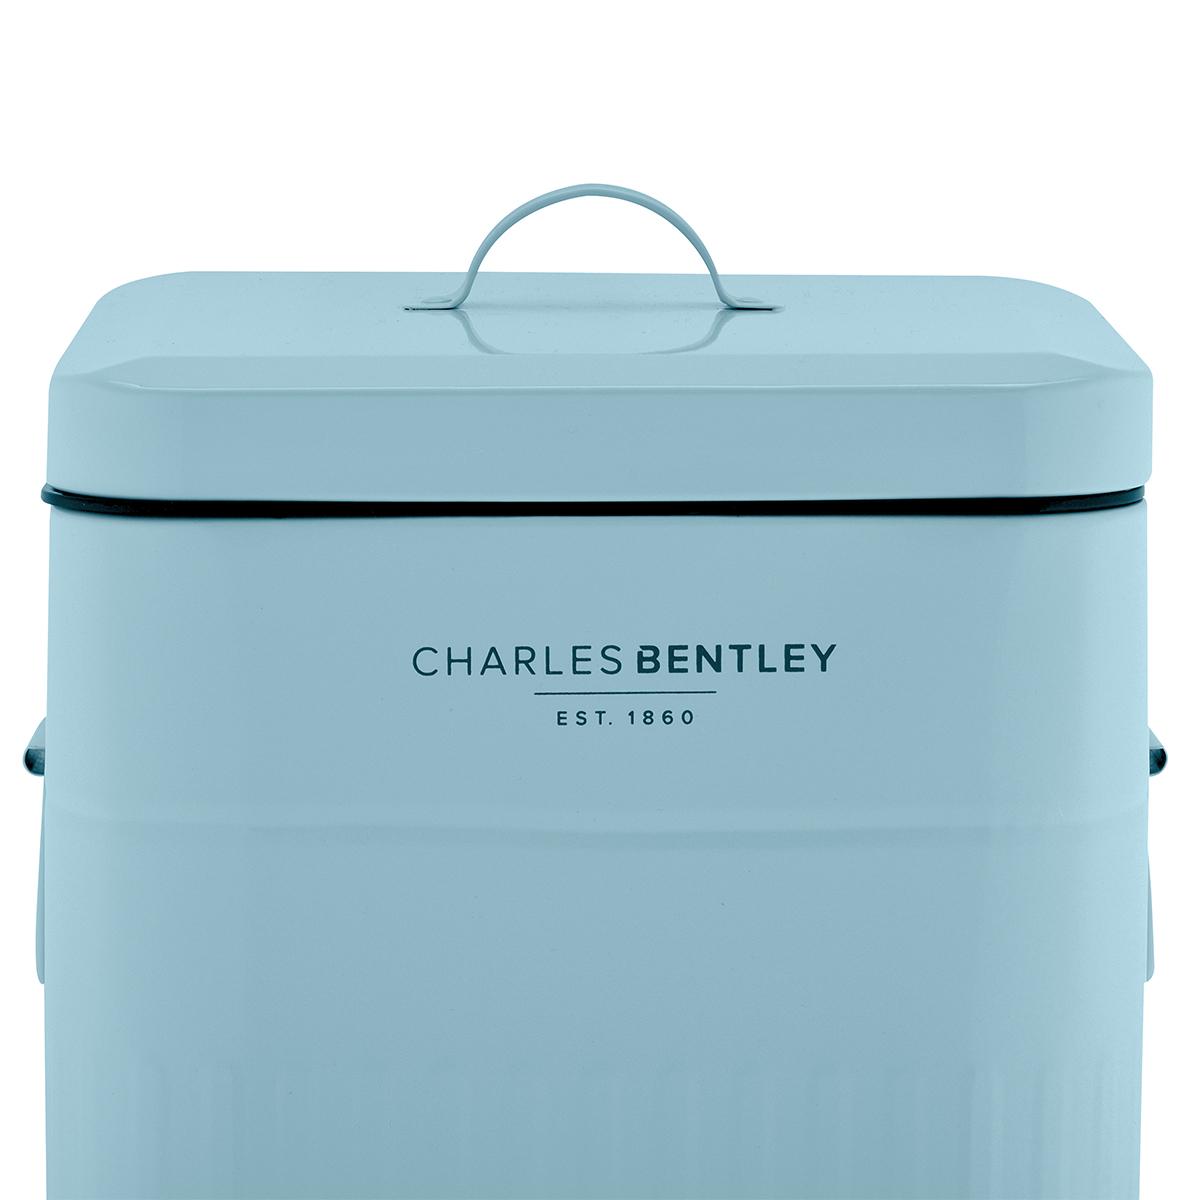 Charles Bentley 30L Steel Square Retro Kitchen Pedal Waste Bin ...